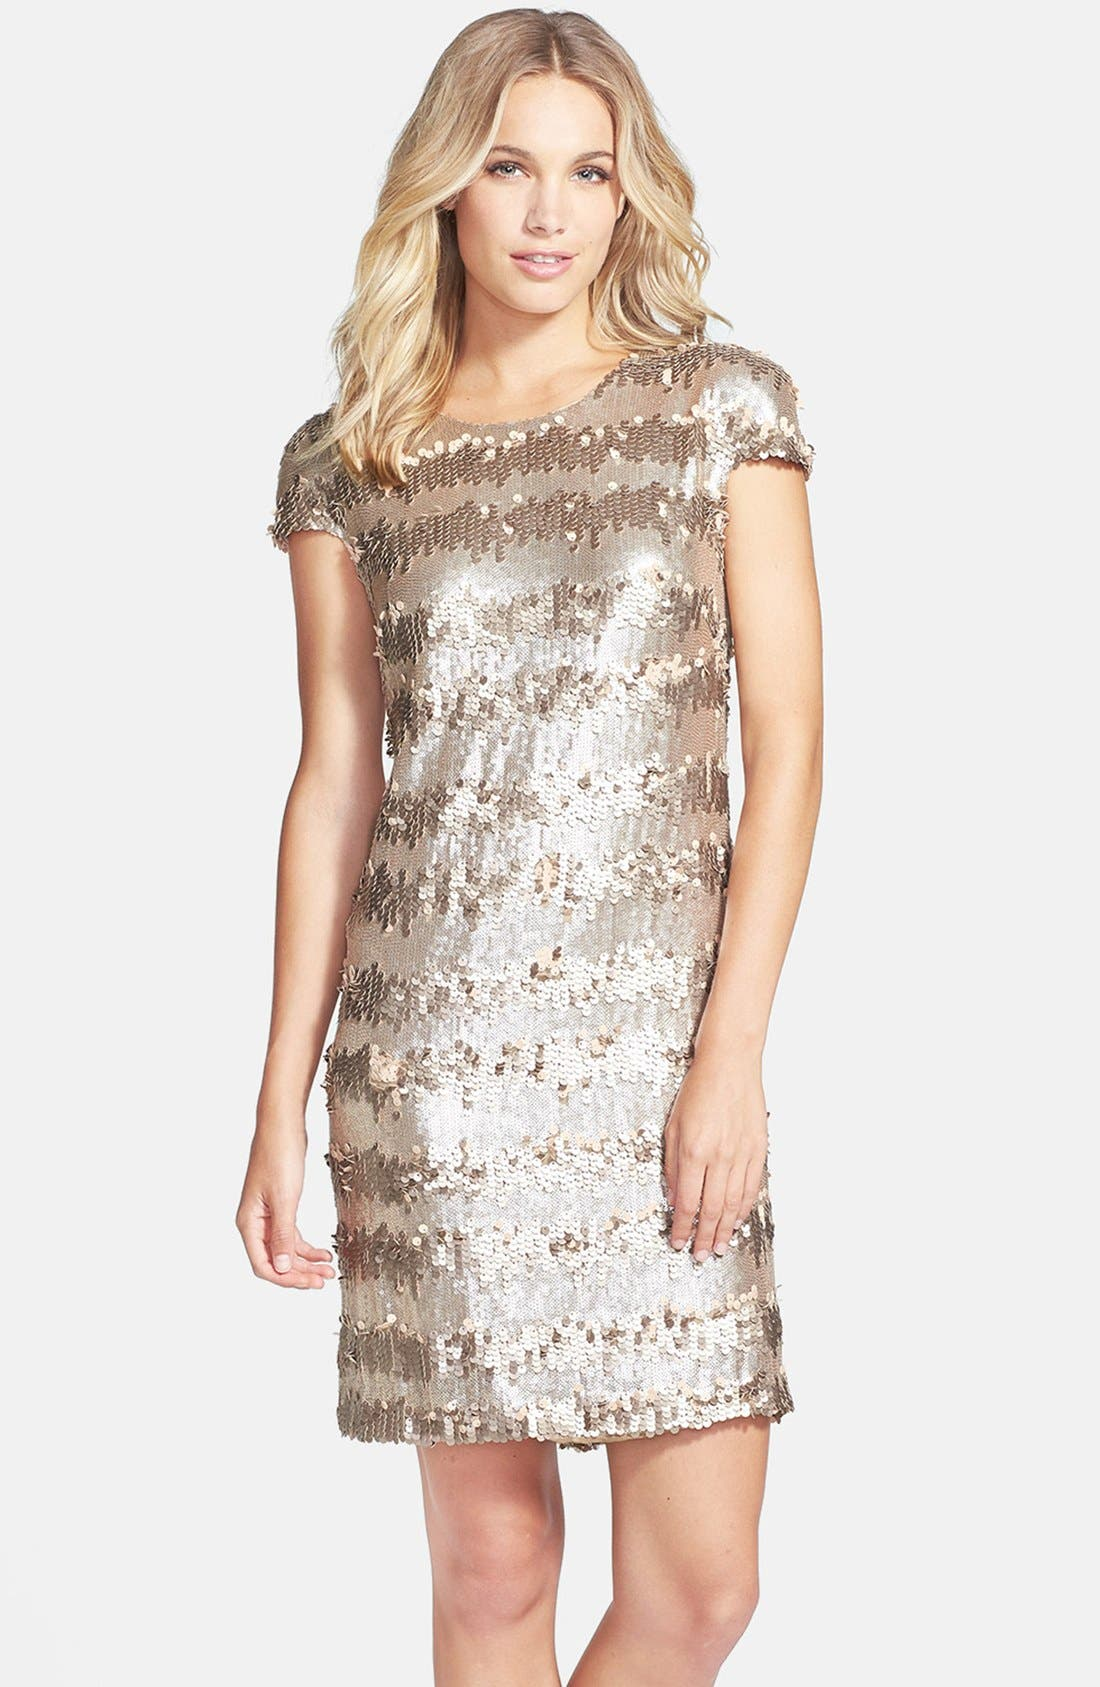 Alternate Image 1 Selected - Vera Wang Gold Paillette & Sequin Shift Dress